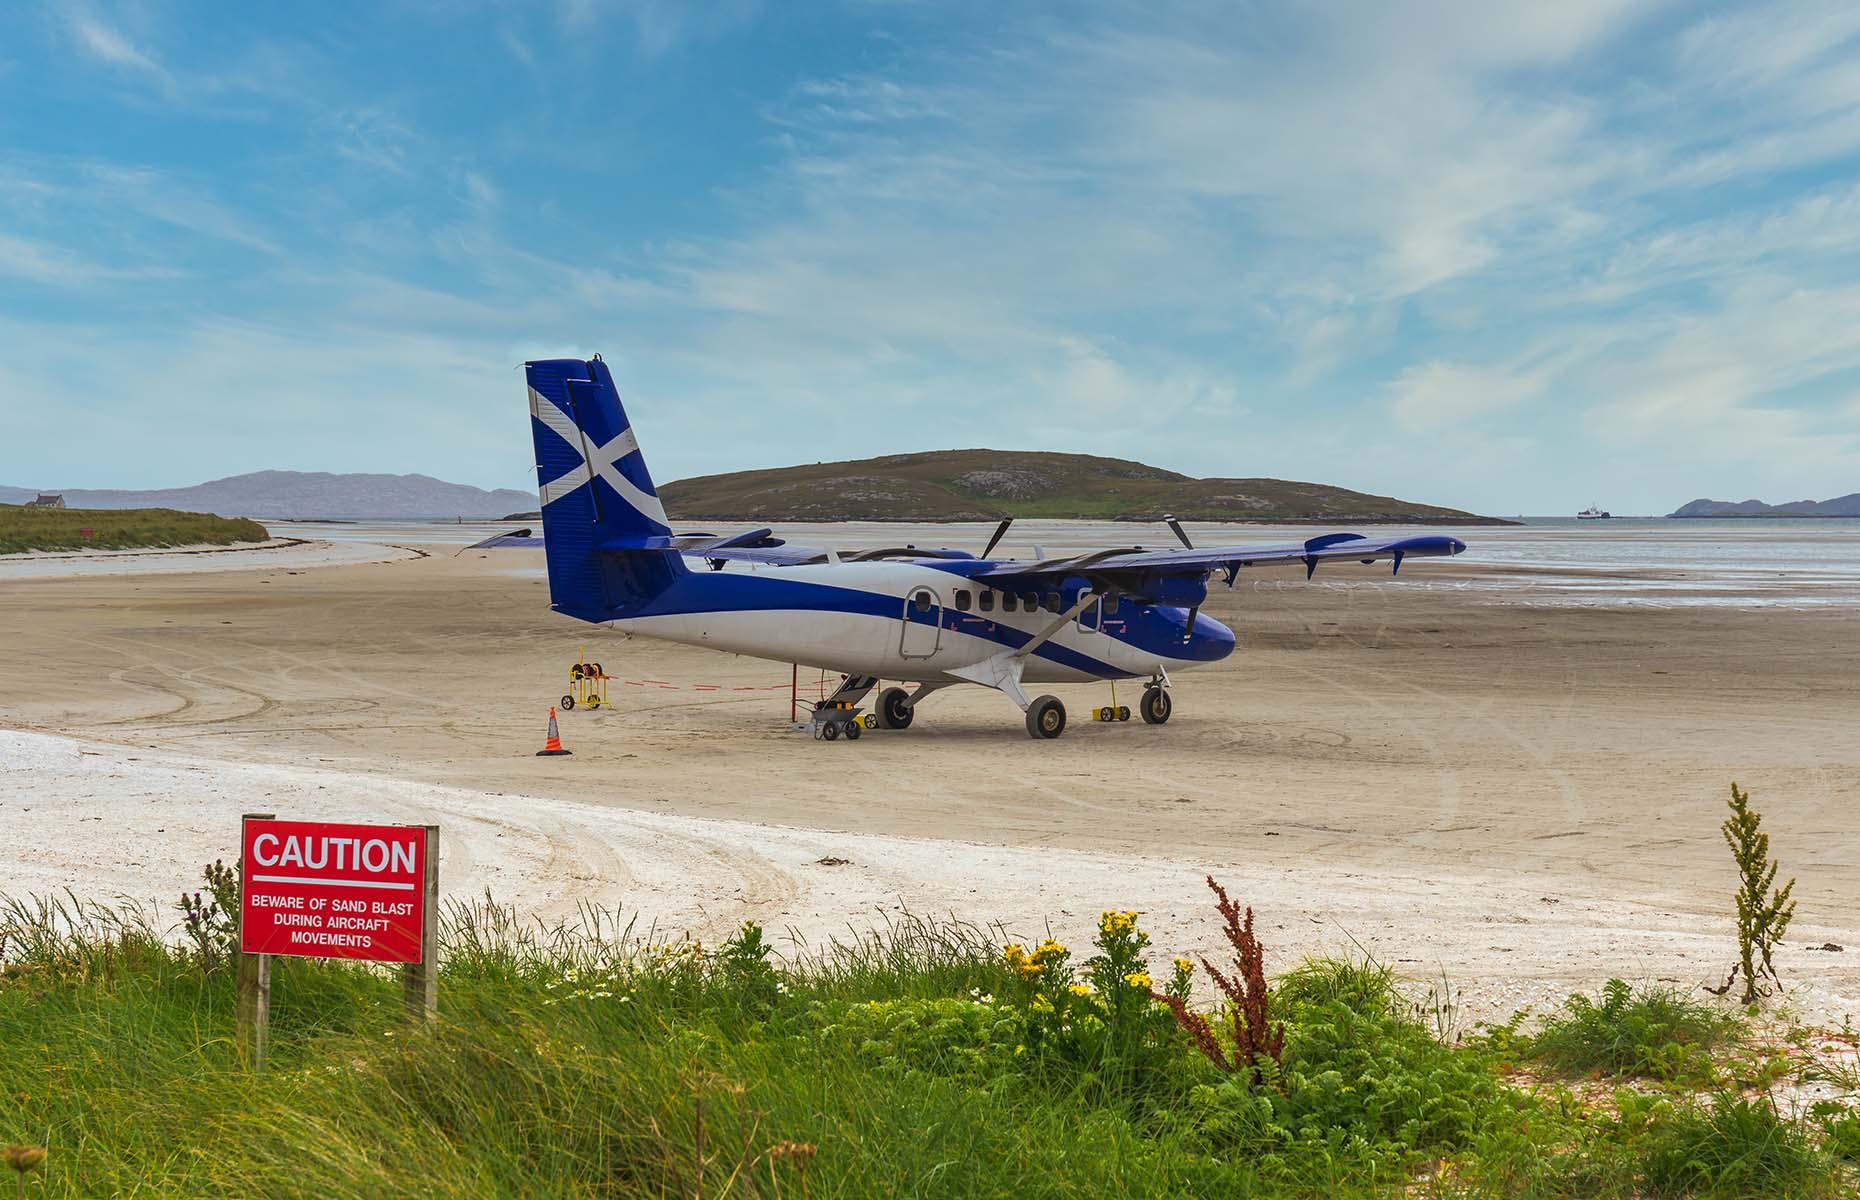 Barra Airport in Scotland (Image: EyesTravelling/Shutterstock)